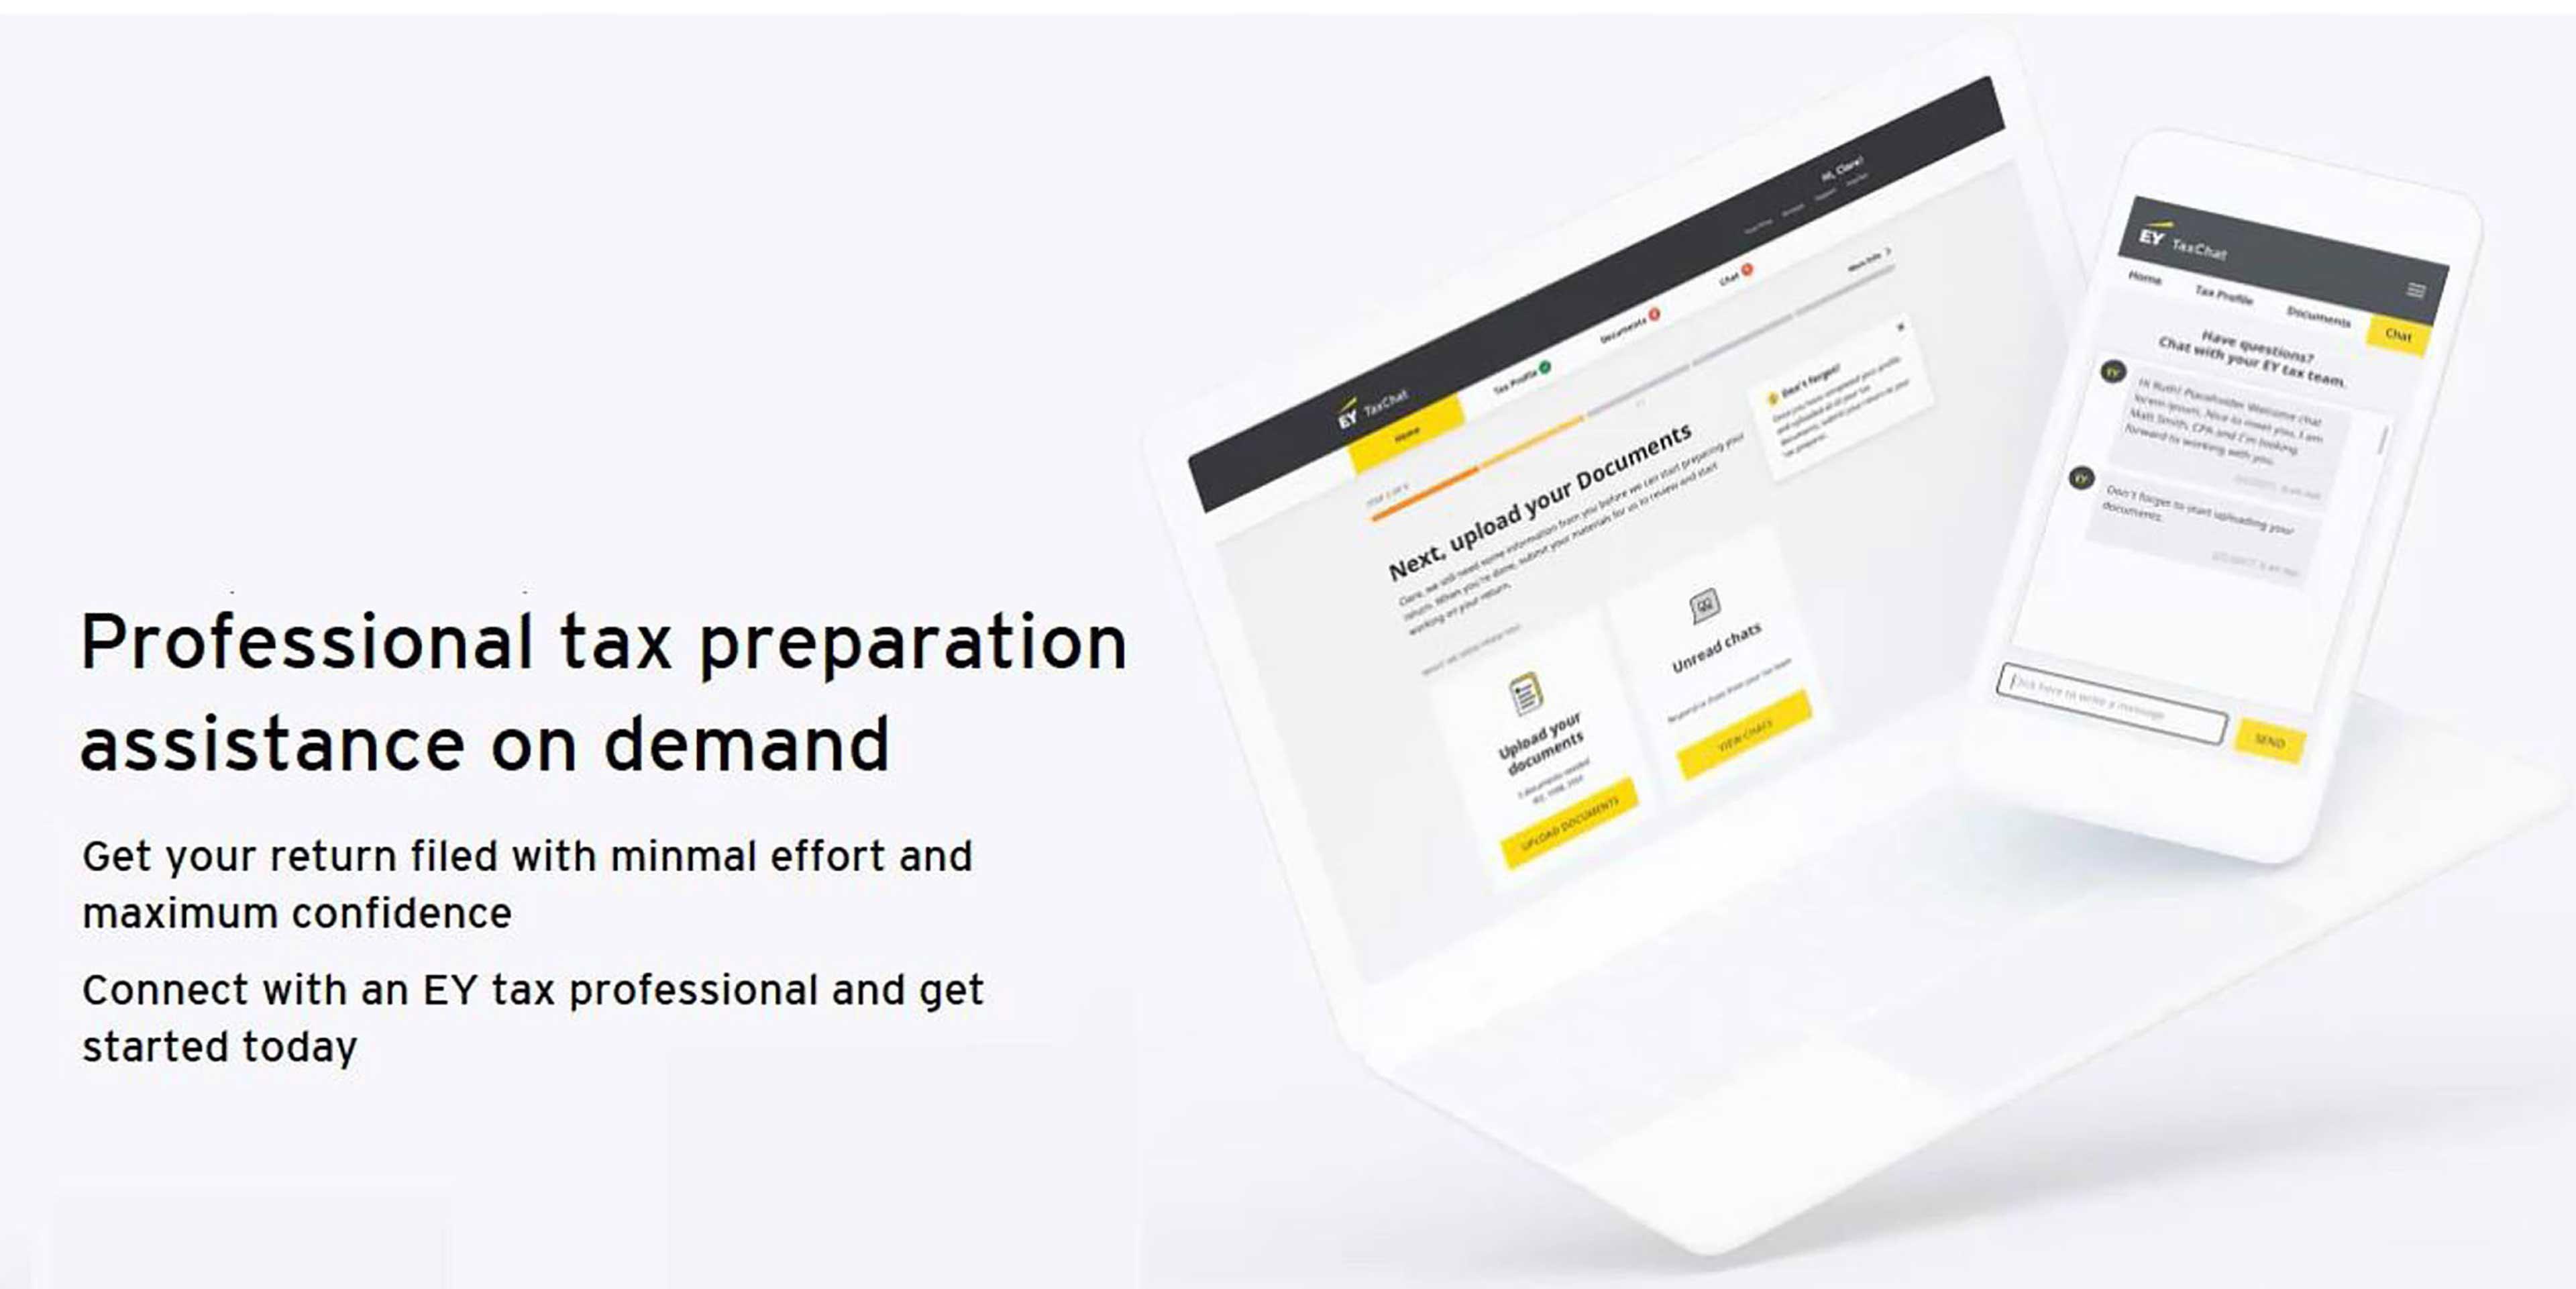 Professional tax preparation assistance on demand